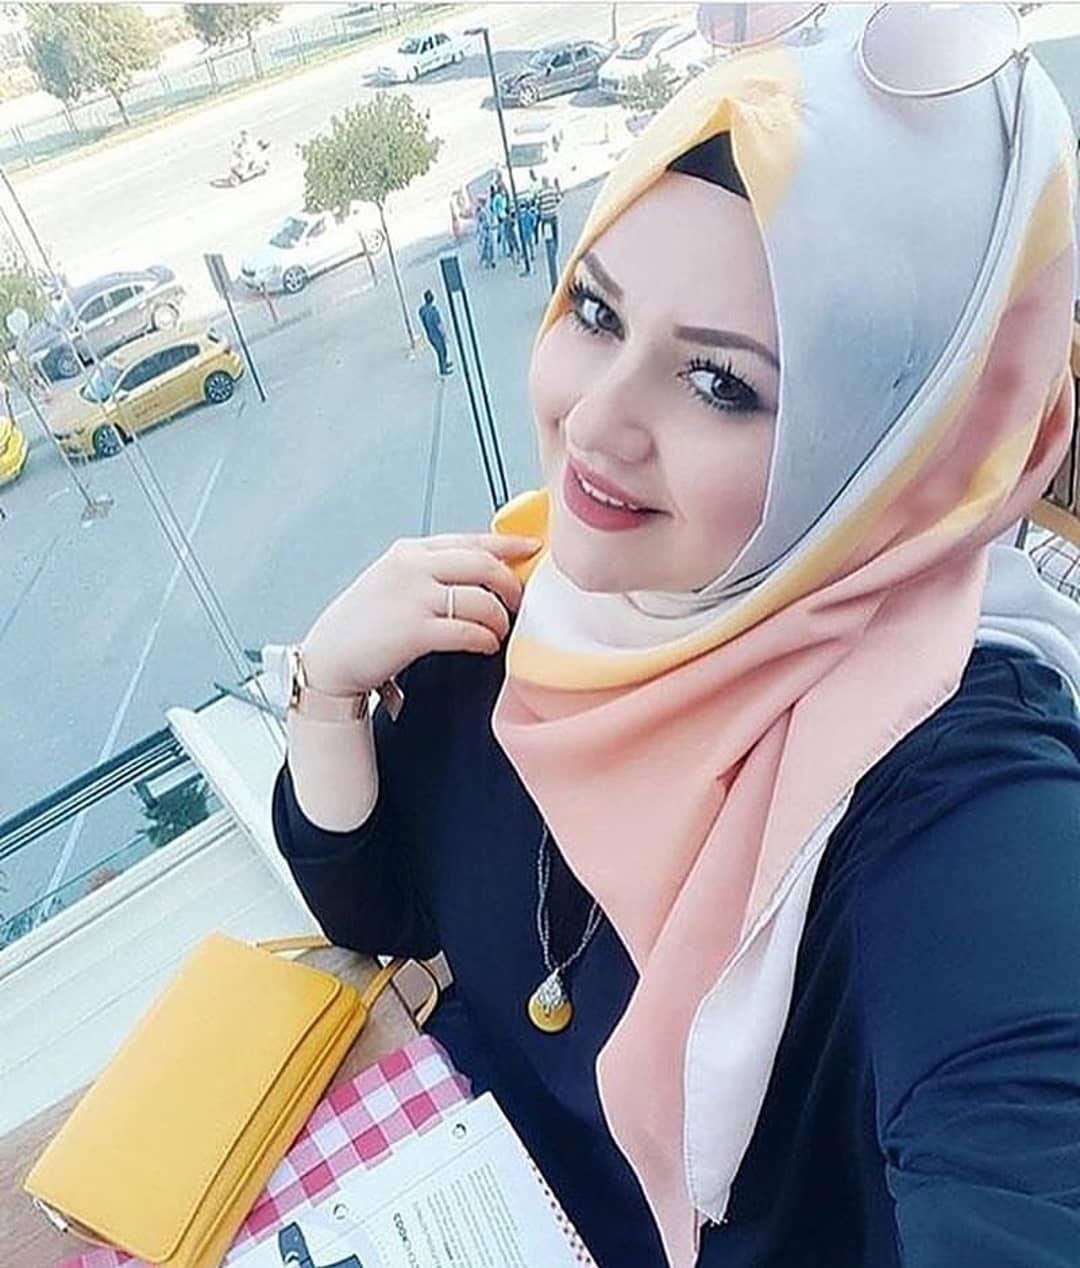 بالصور صور بنات محجبات 2019 , اجمل بروفيل لعاشقات الحجاب 1032 6